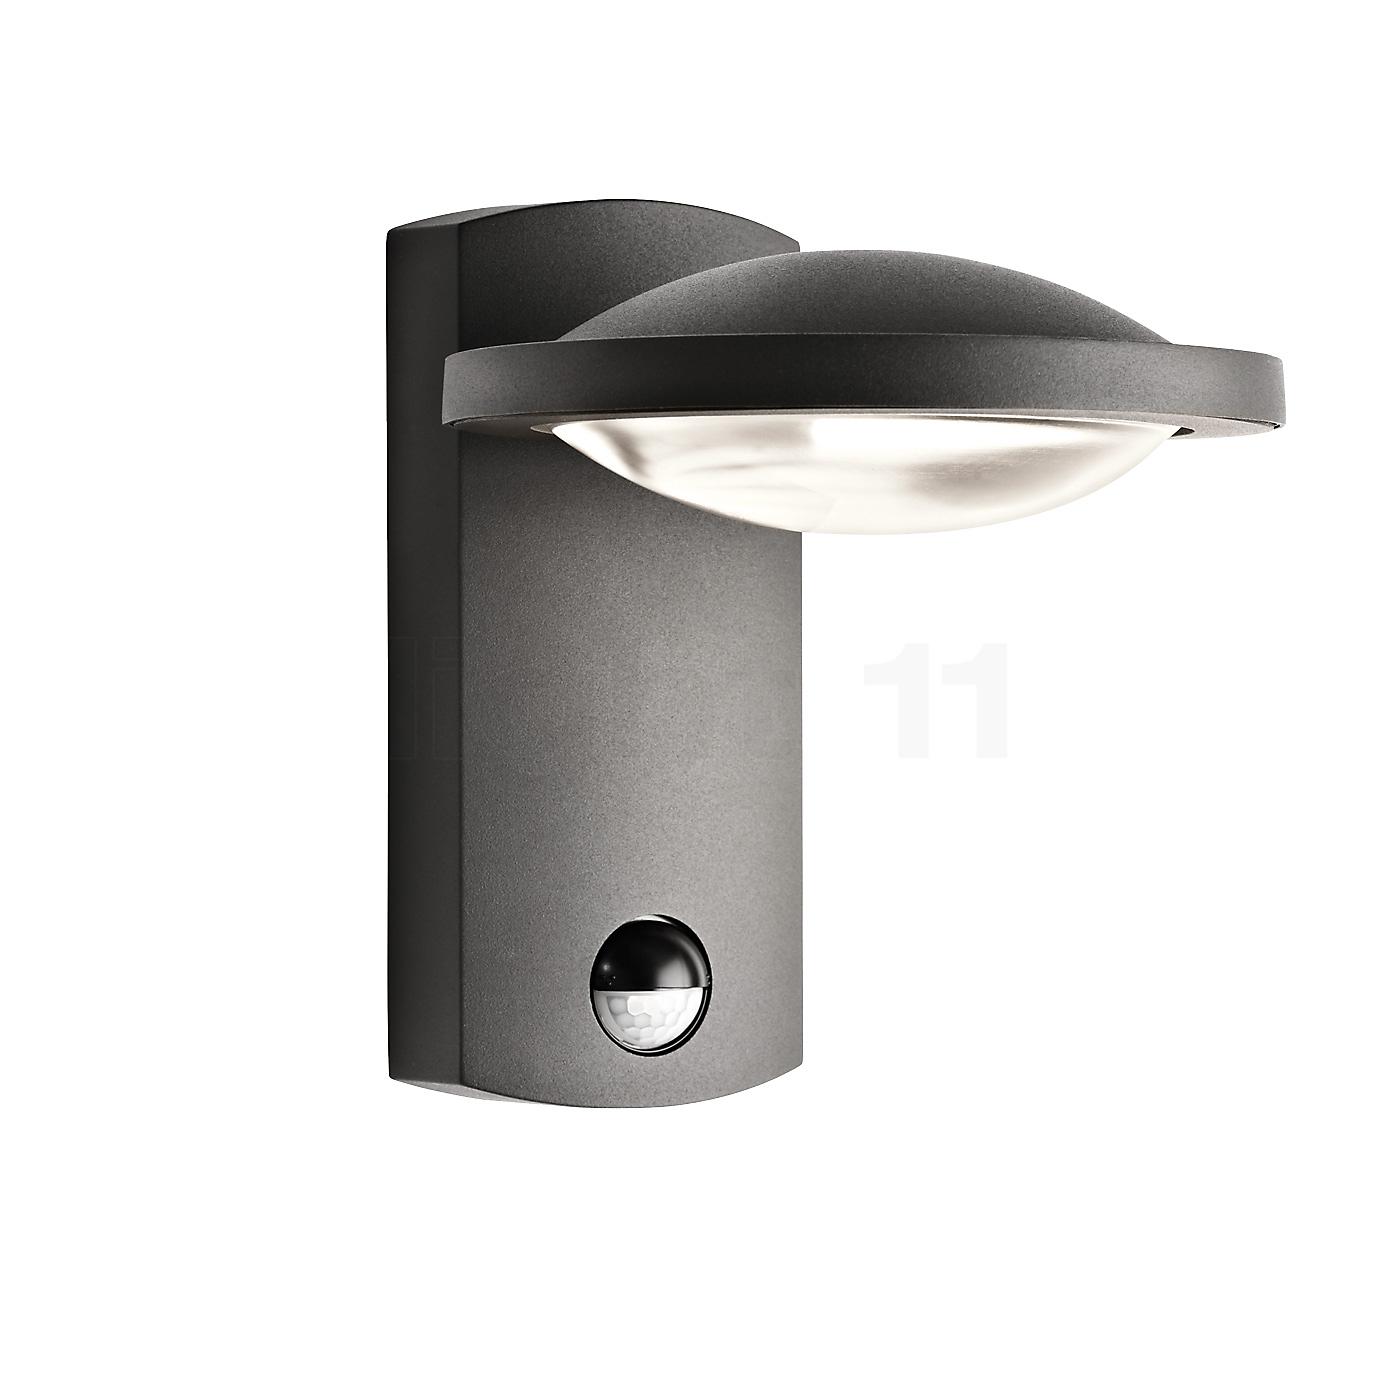 Philips Ledino Freedom Wall light LED 17239 - Wall lights - lamps & lights - light11.eu